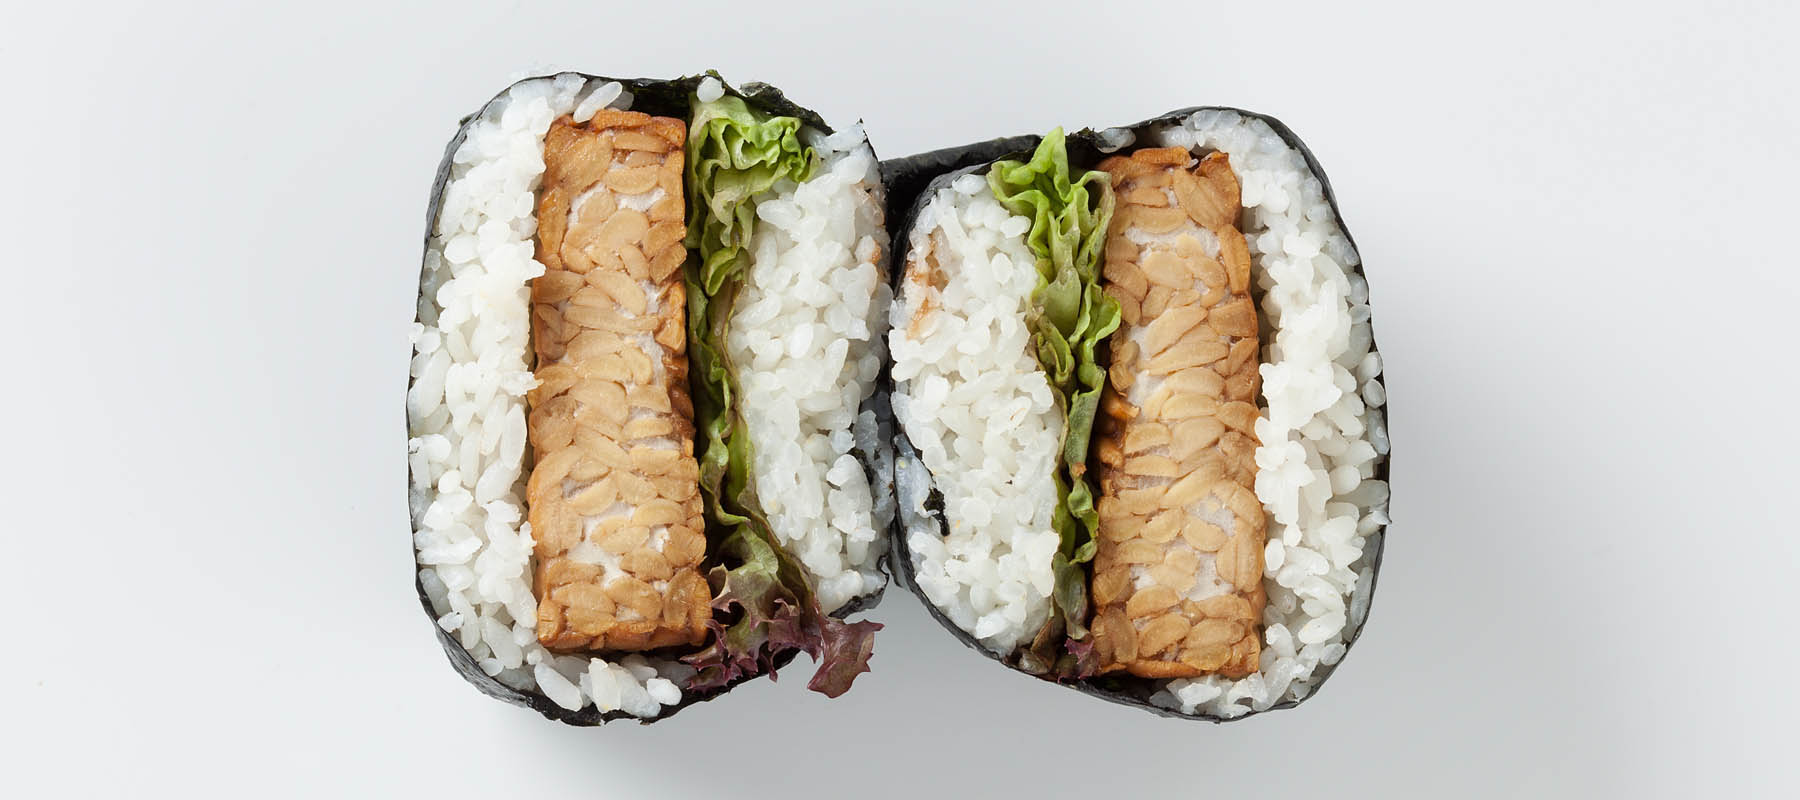 1800x800_Onigirazu_Tempei_kame_japanese_bakery_1